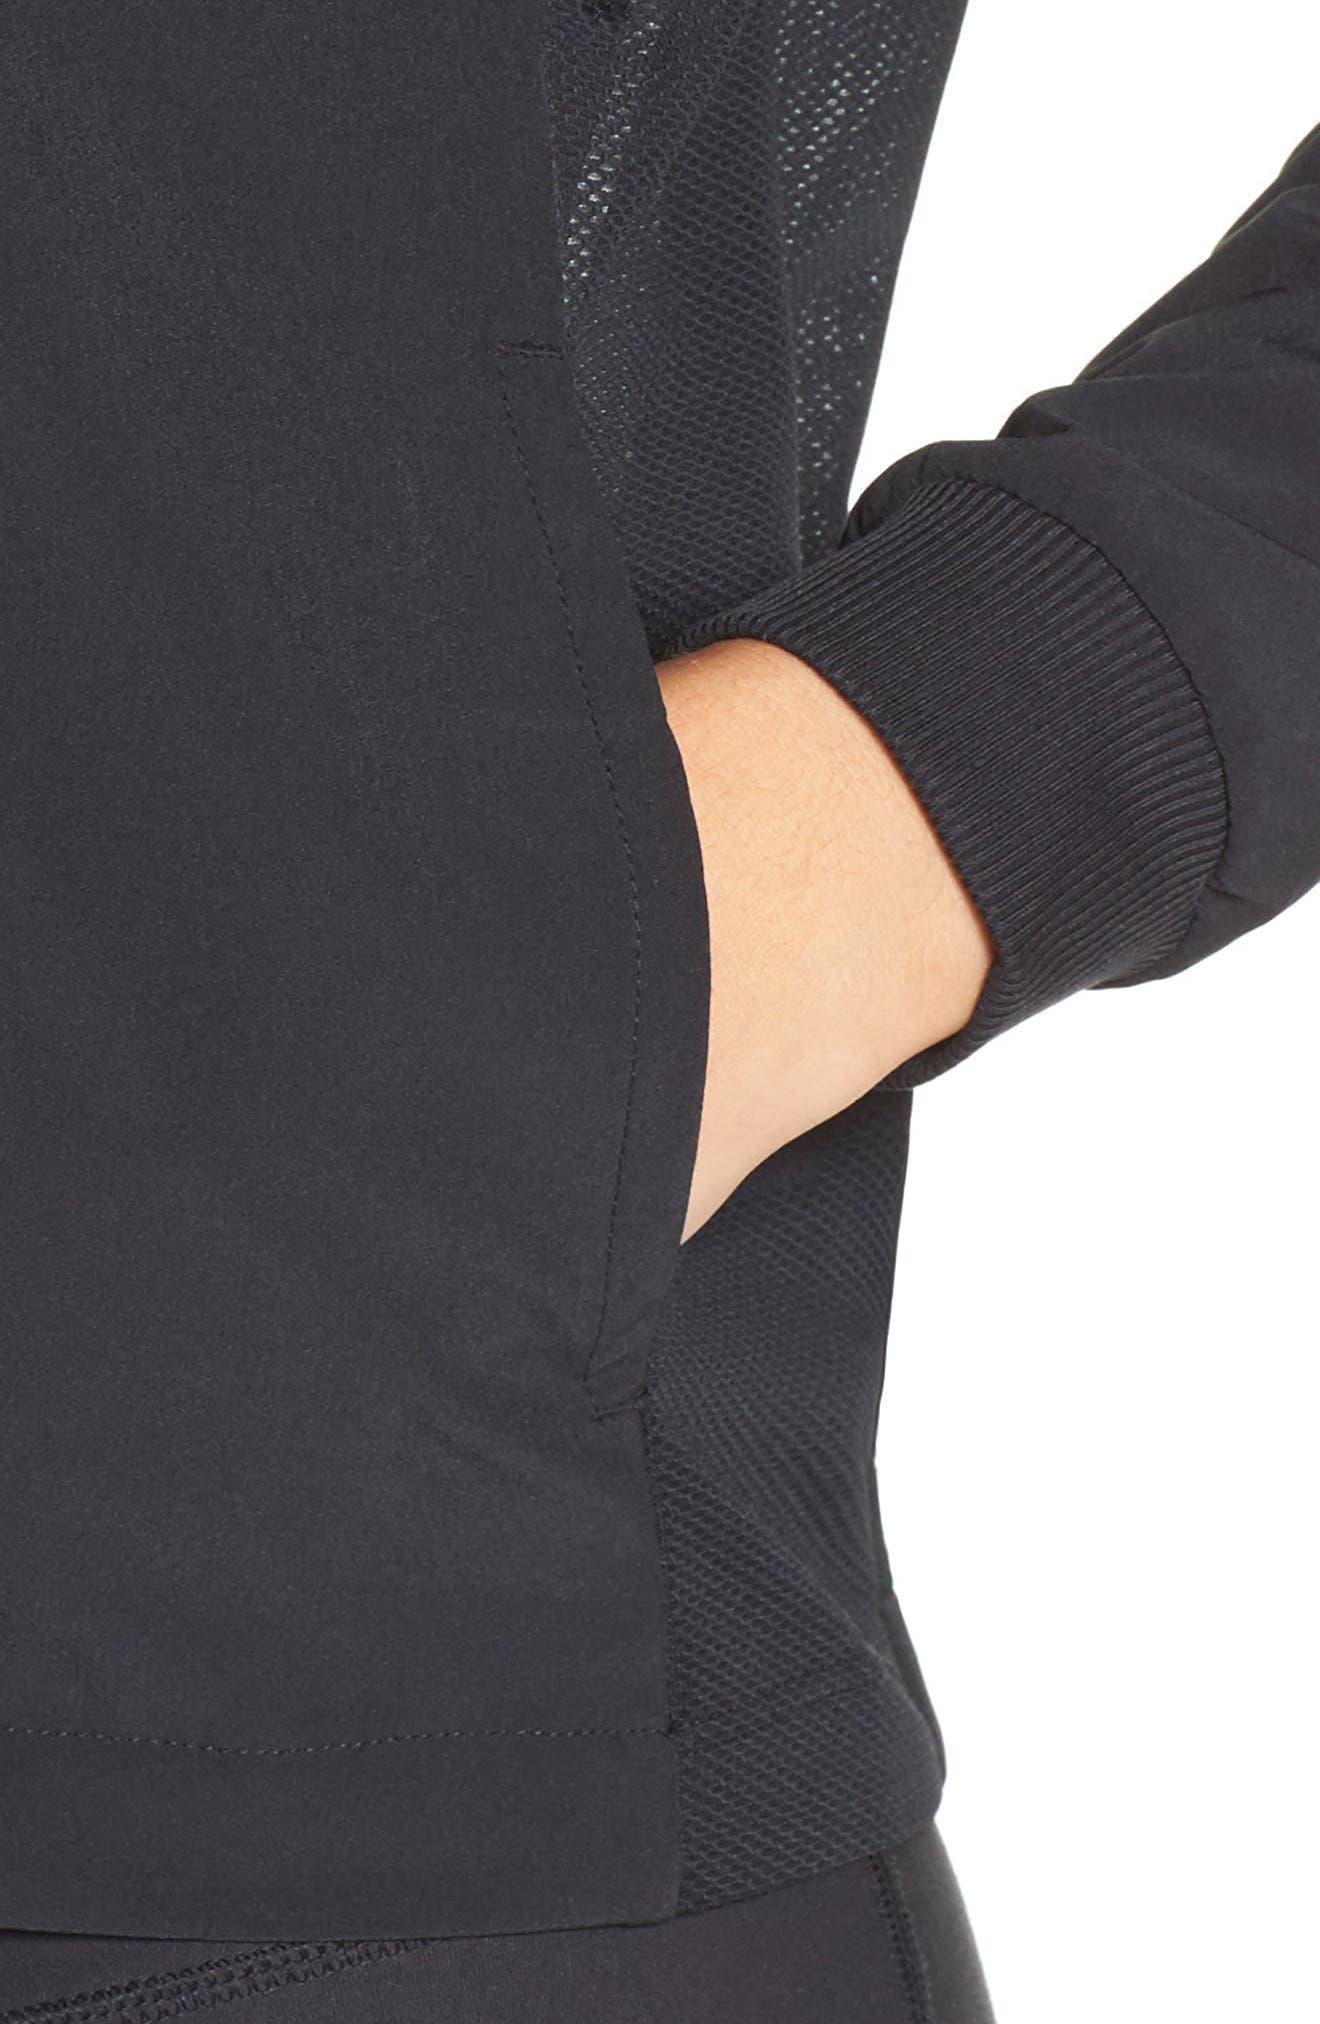 Flex Dri-FIT Training Jacket,                             Alternate thumbnail 4, color,                             010